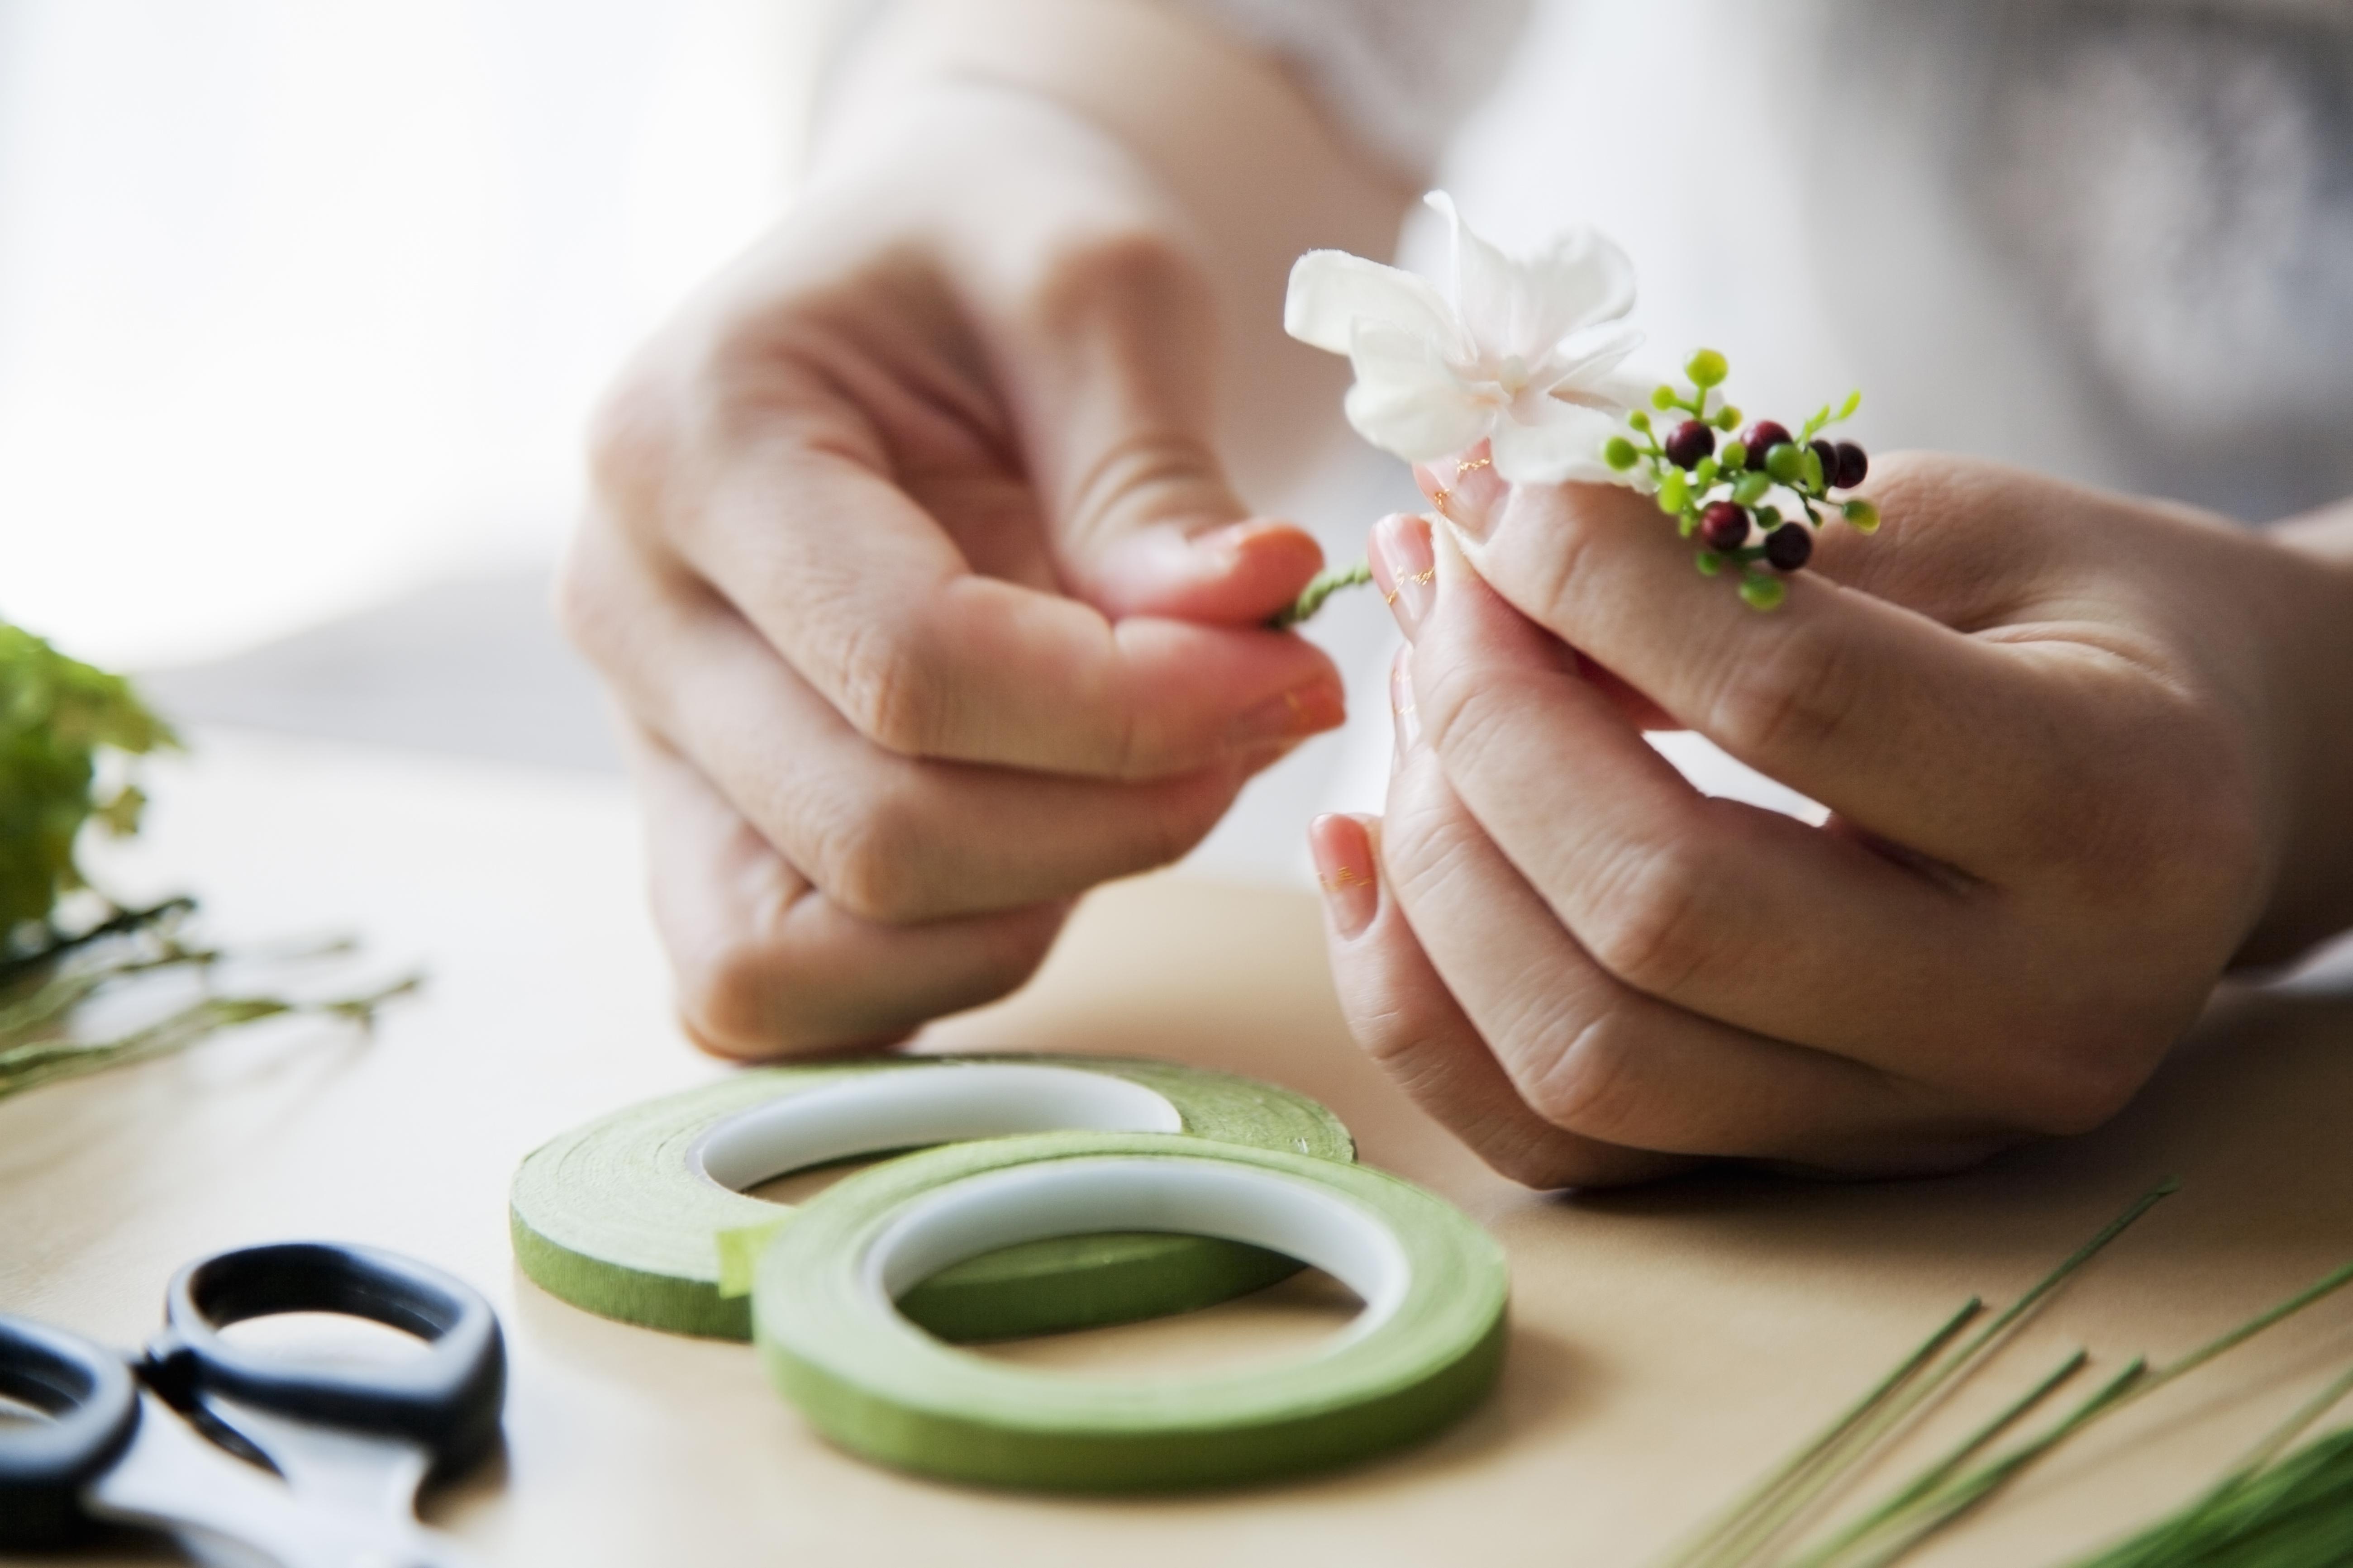 d905b4b58a63480484f74d8ede4eff5e - 9 ways to save money on your wedding flowers